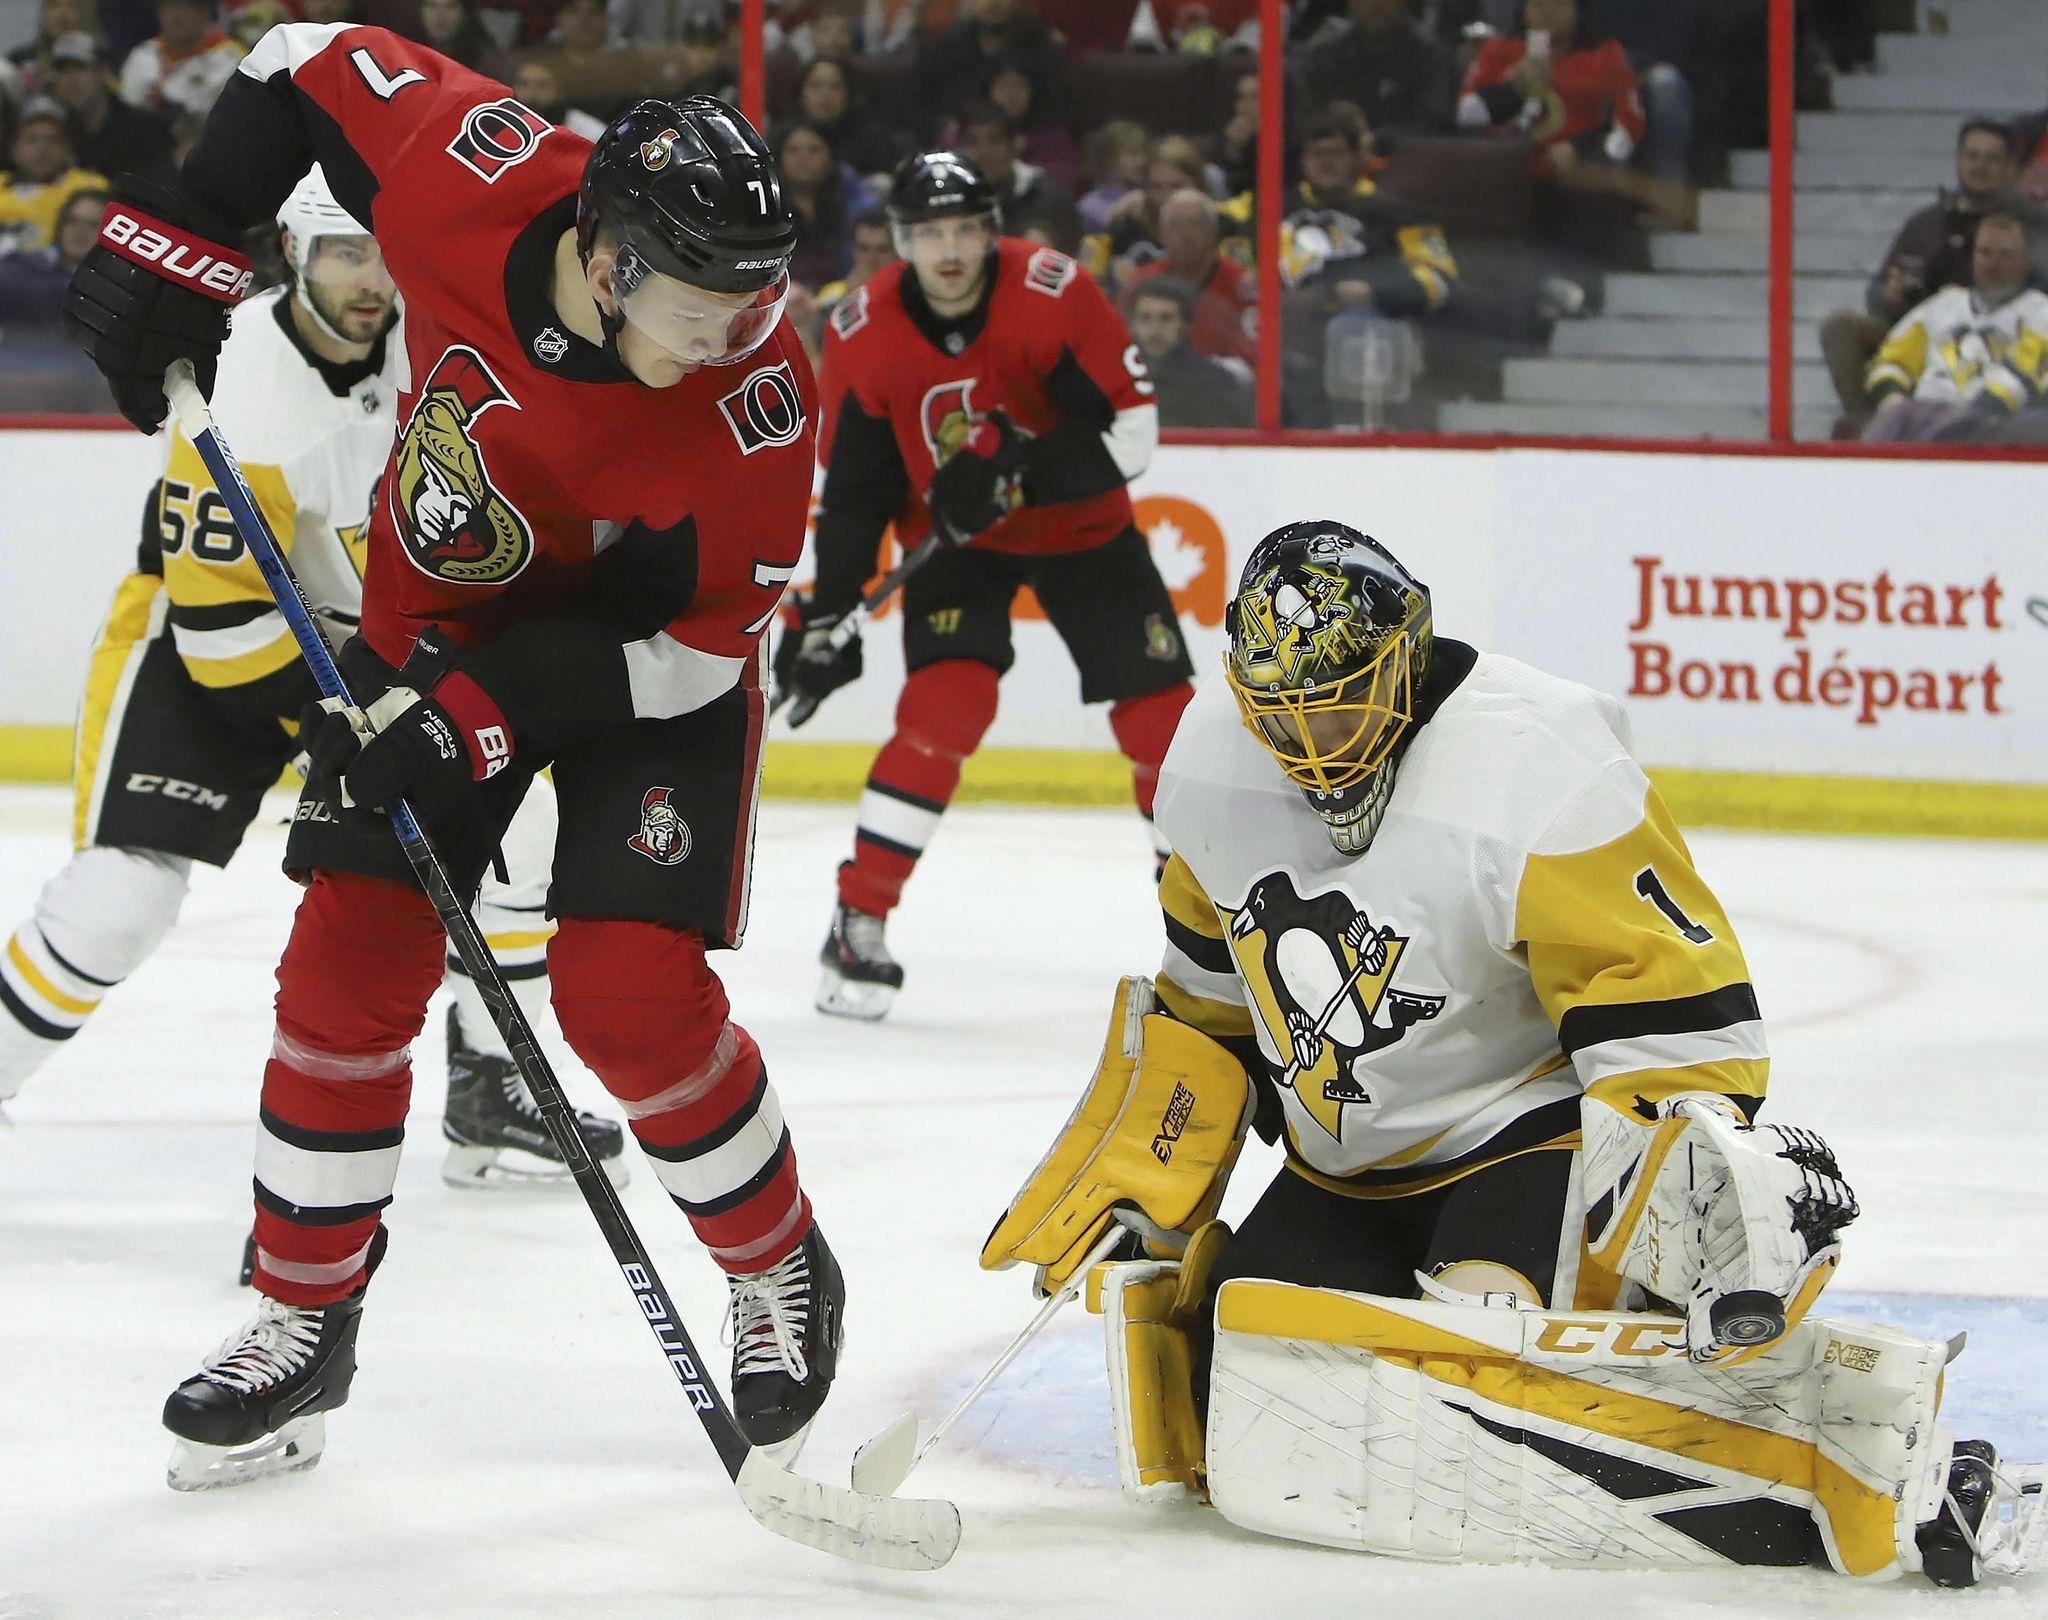 Penguins_senators_hockey_76598_s2048x1620